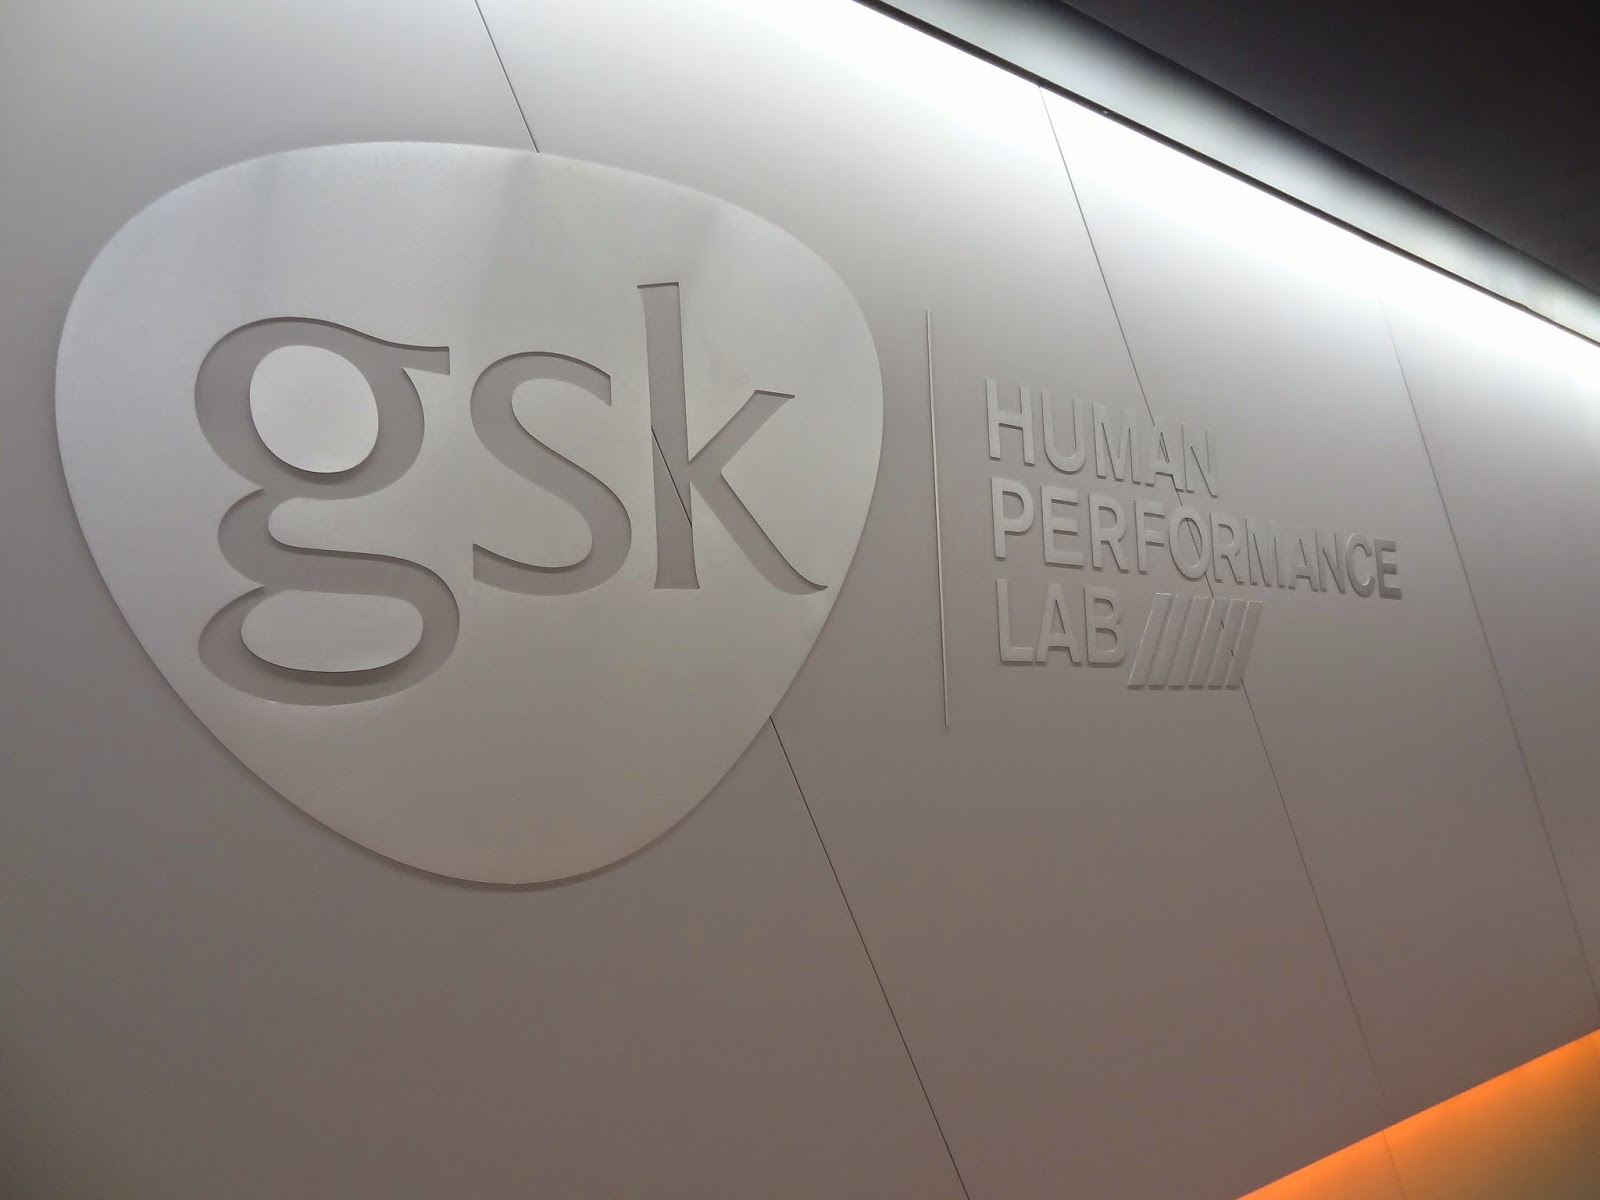 GSK_Human_Performance_Lab.JPG